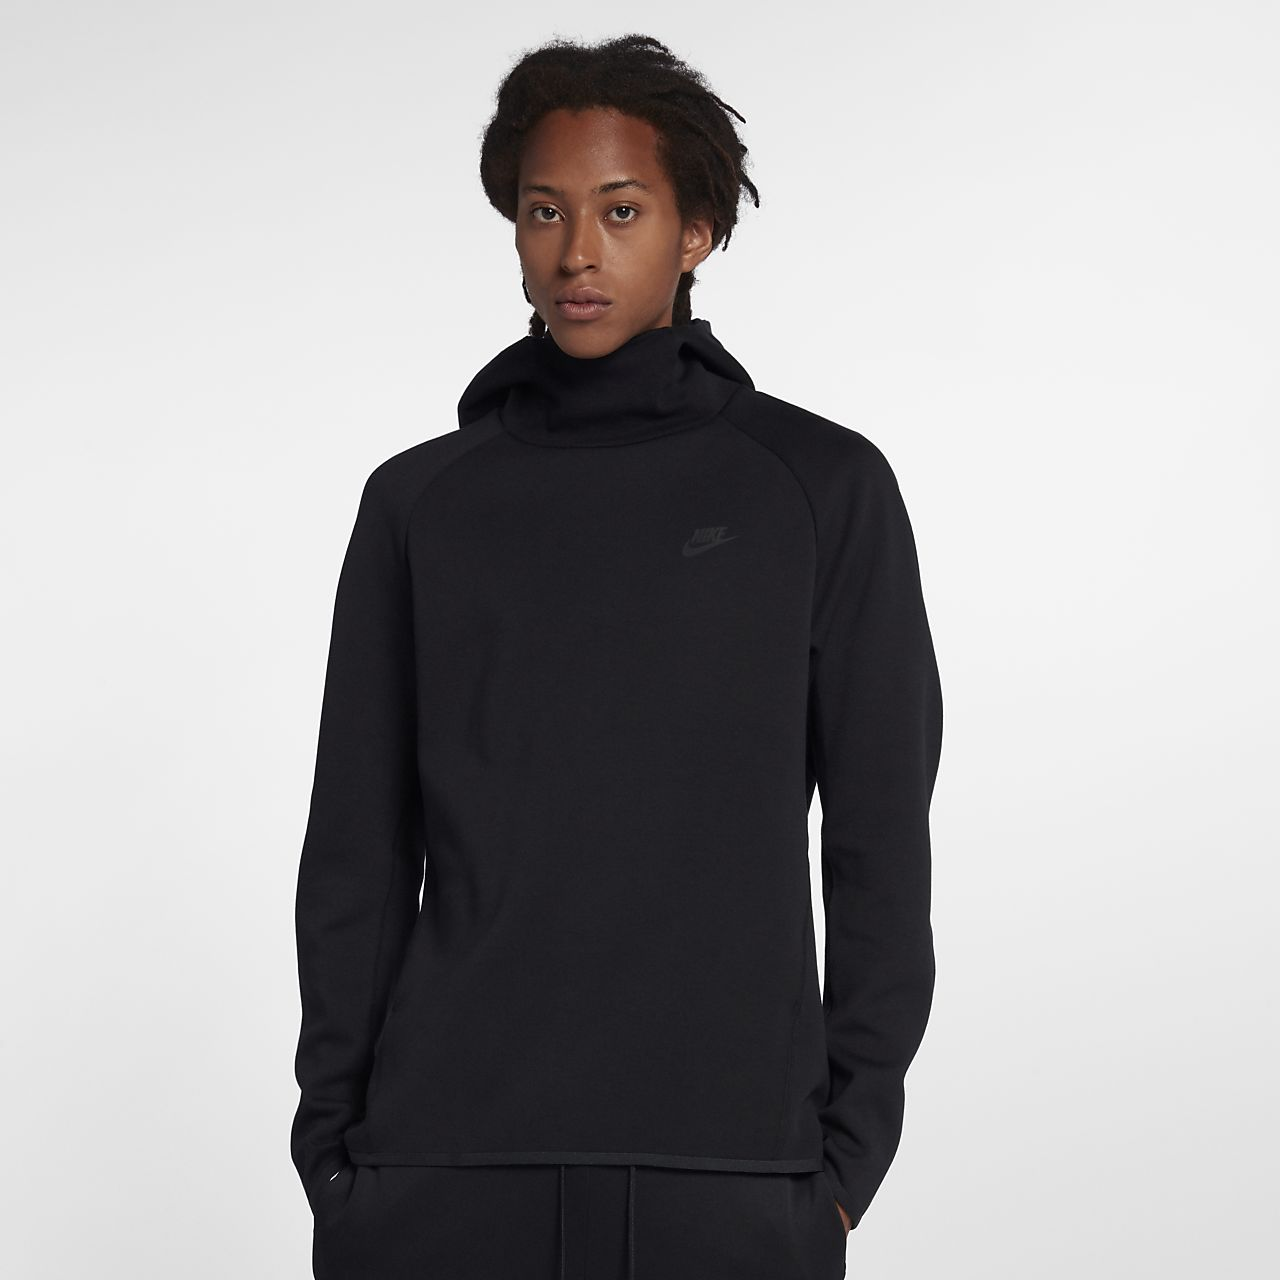 45d731cf592917 Męska bluza z kapturem Nike Sportswear Tech Fleece. Nike.com PL